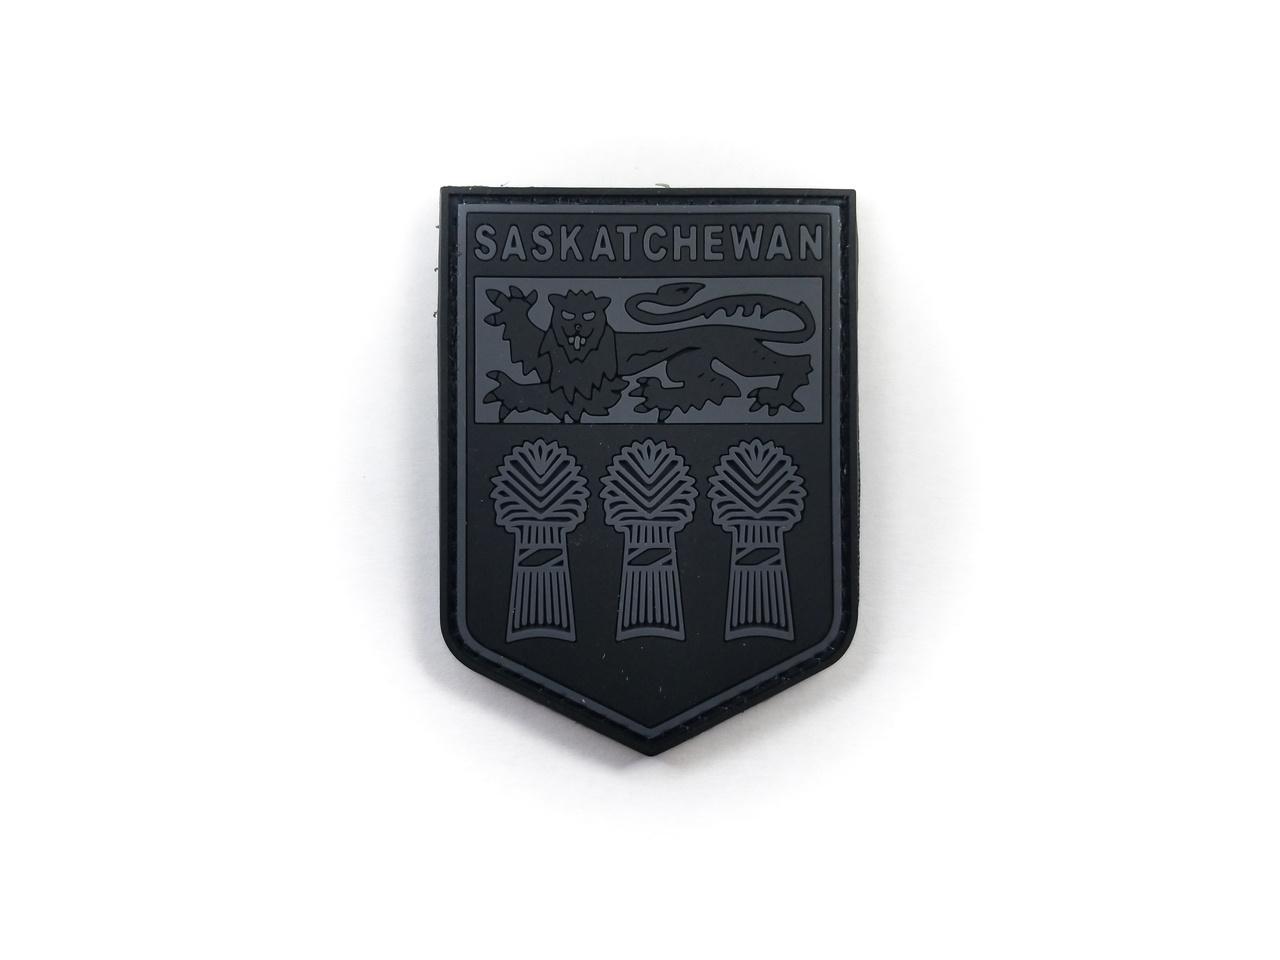 Tactical Innovations Canada PVC Patch - Saskatchewan - Black/Grey